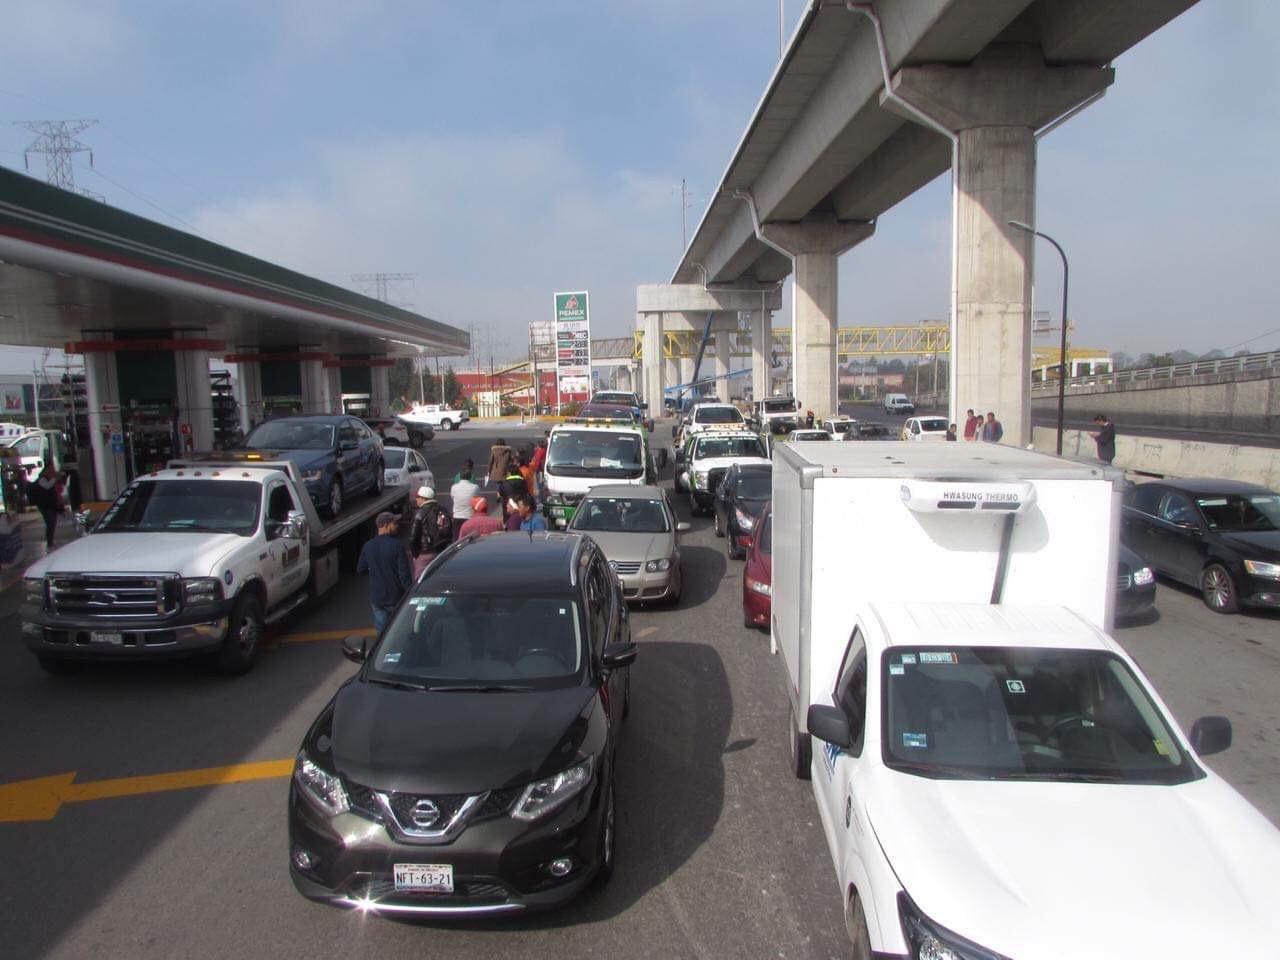 Gasolina mezclada con agua deja averiados decenas de autos